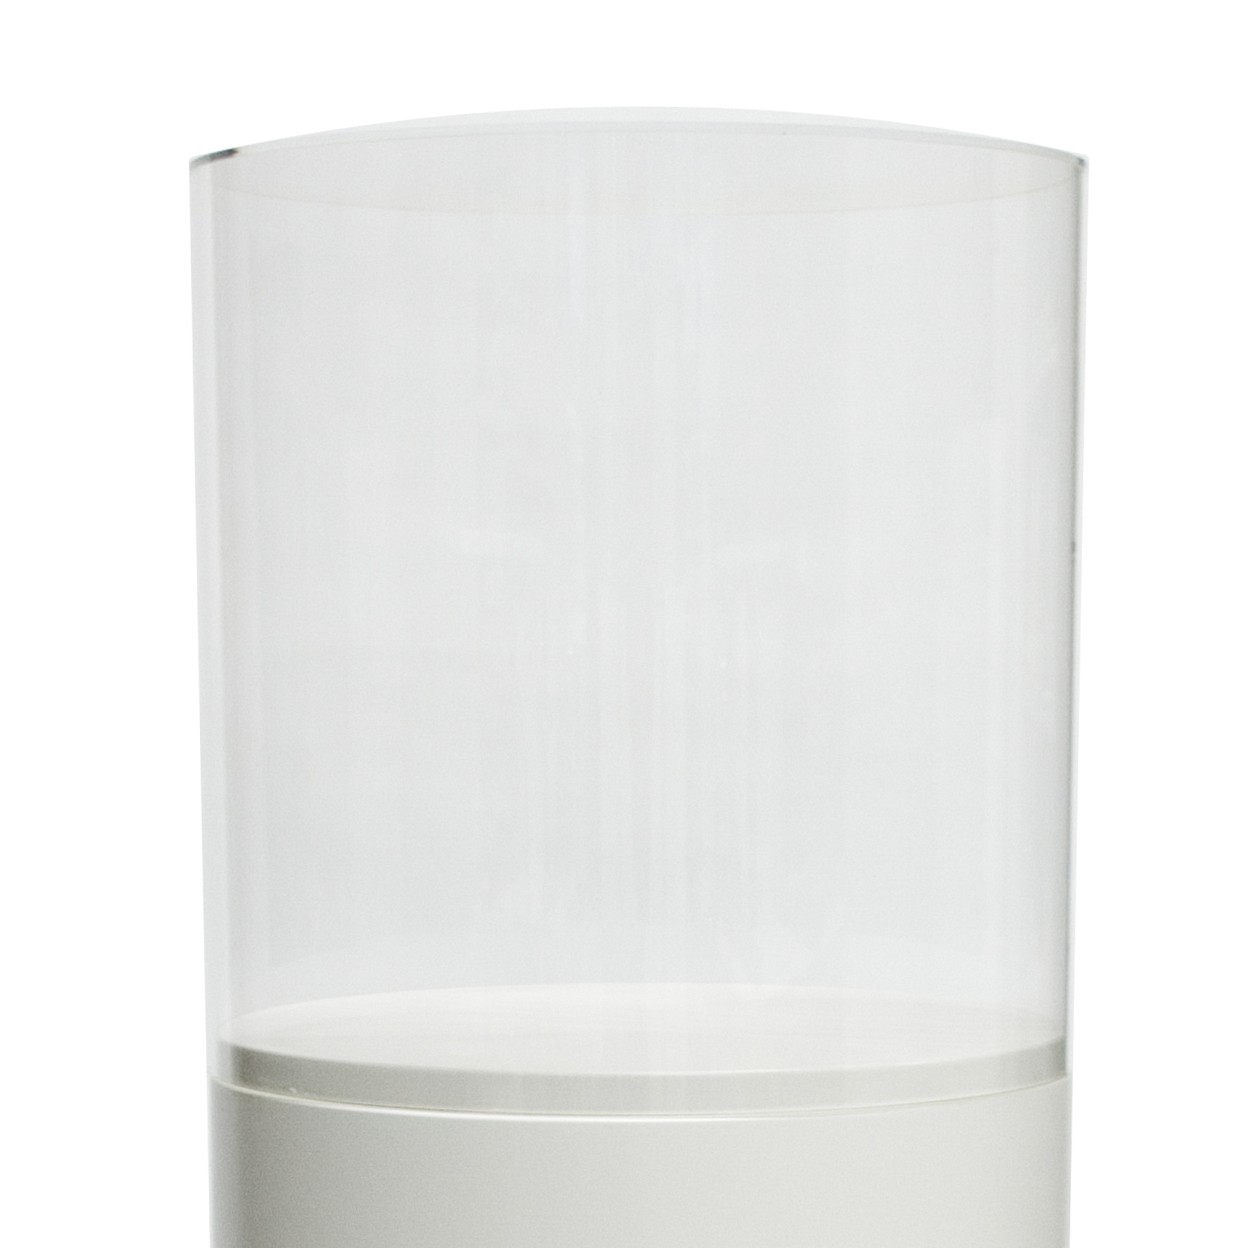 Runde acrylglas schutzkappe